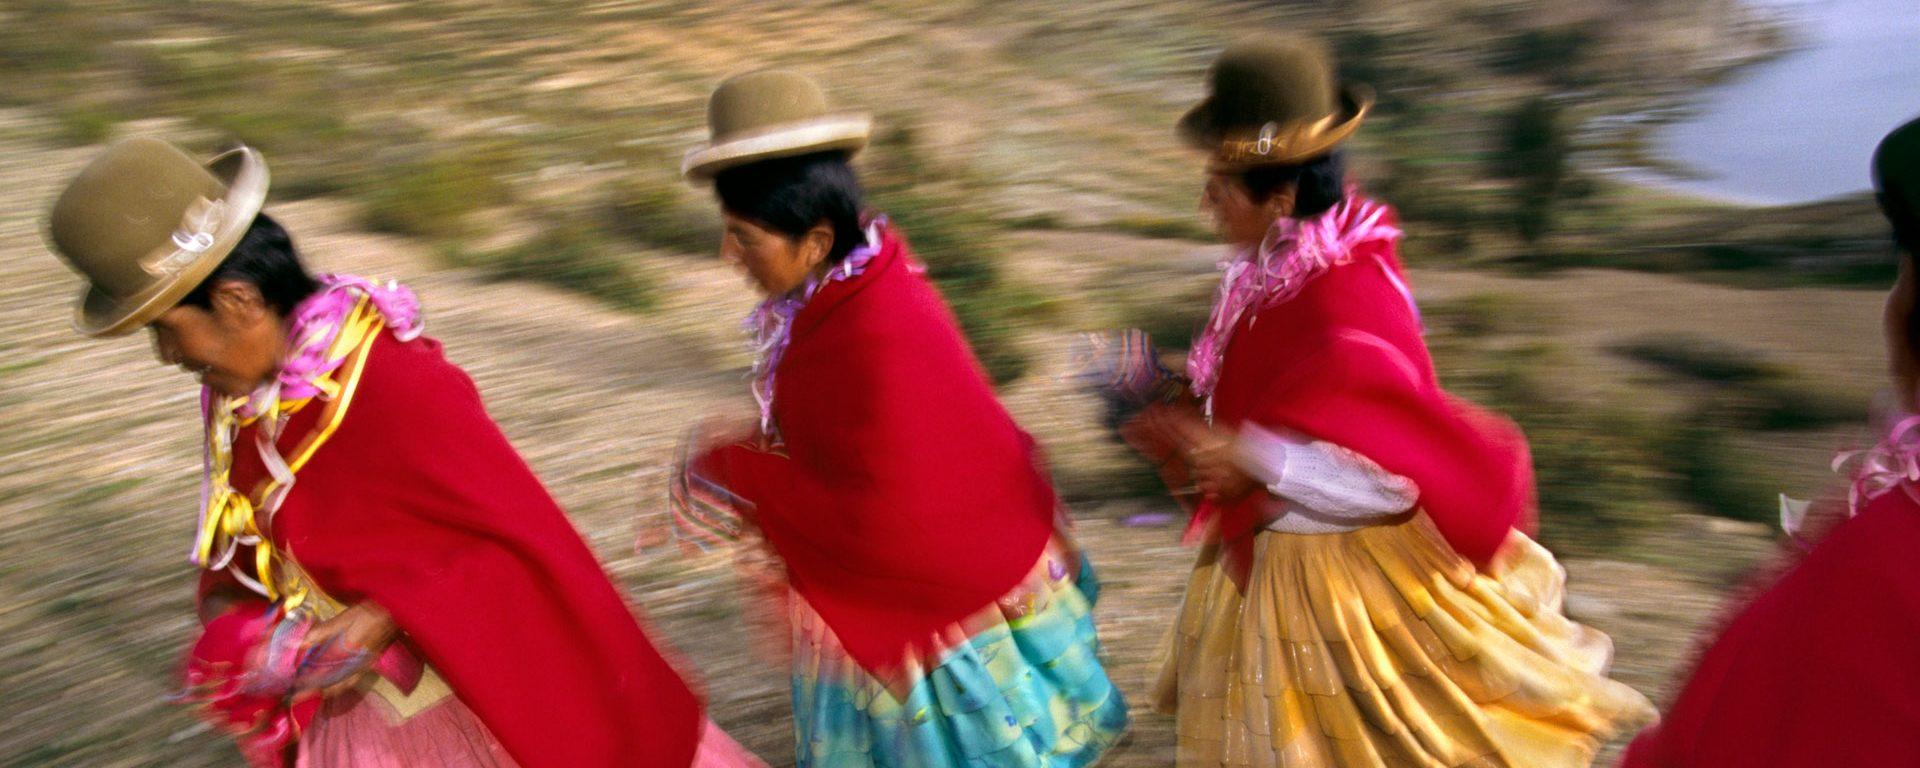 Woman in traditional dress on Isla del Sol, Bolivia